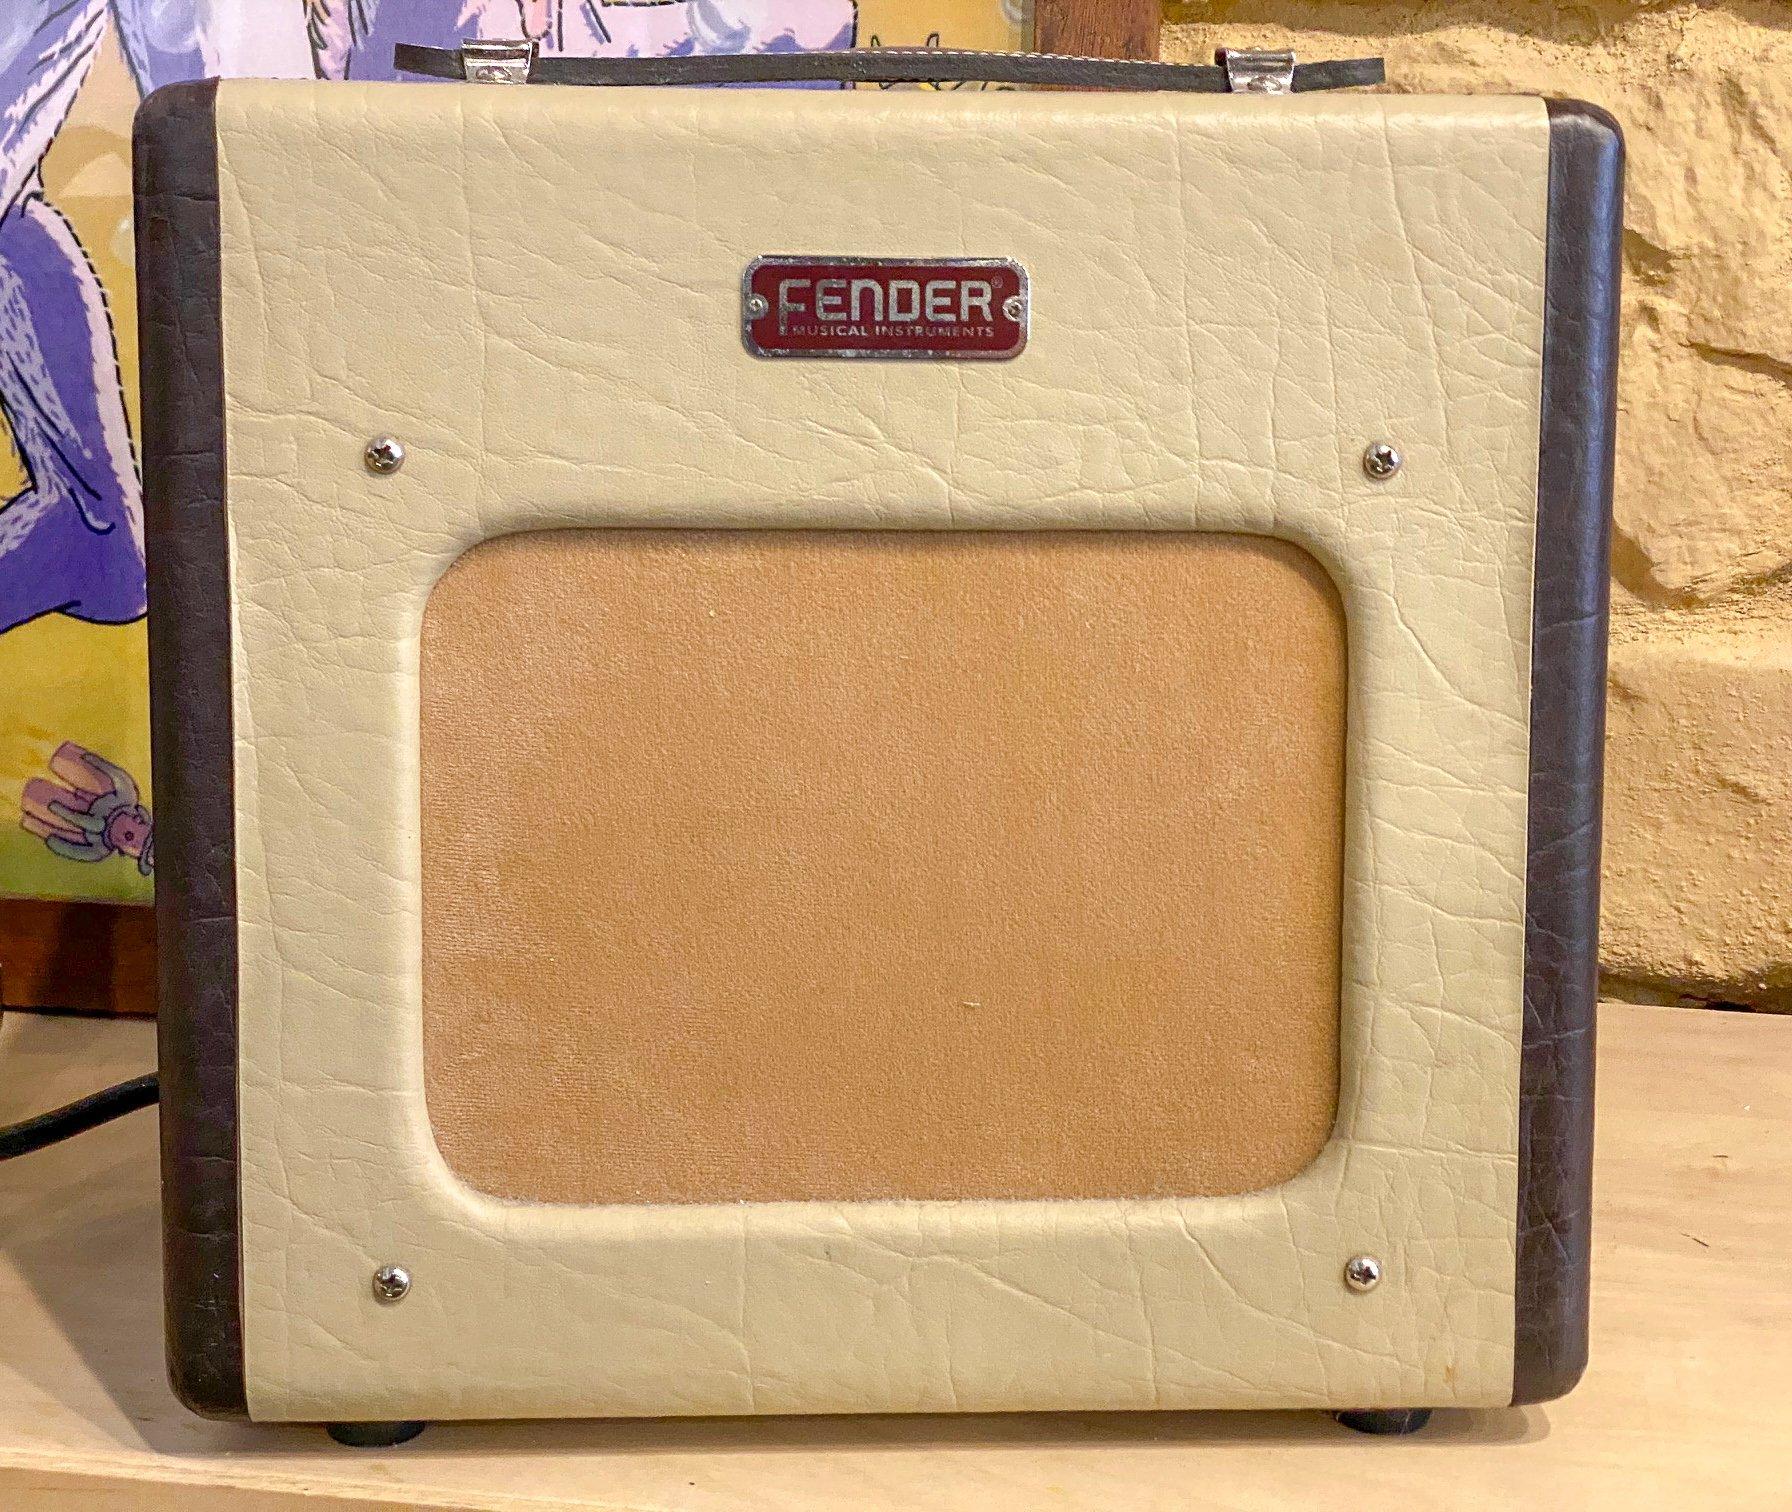 Fender Champion 600 5w 1x6 tube combo